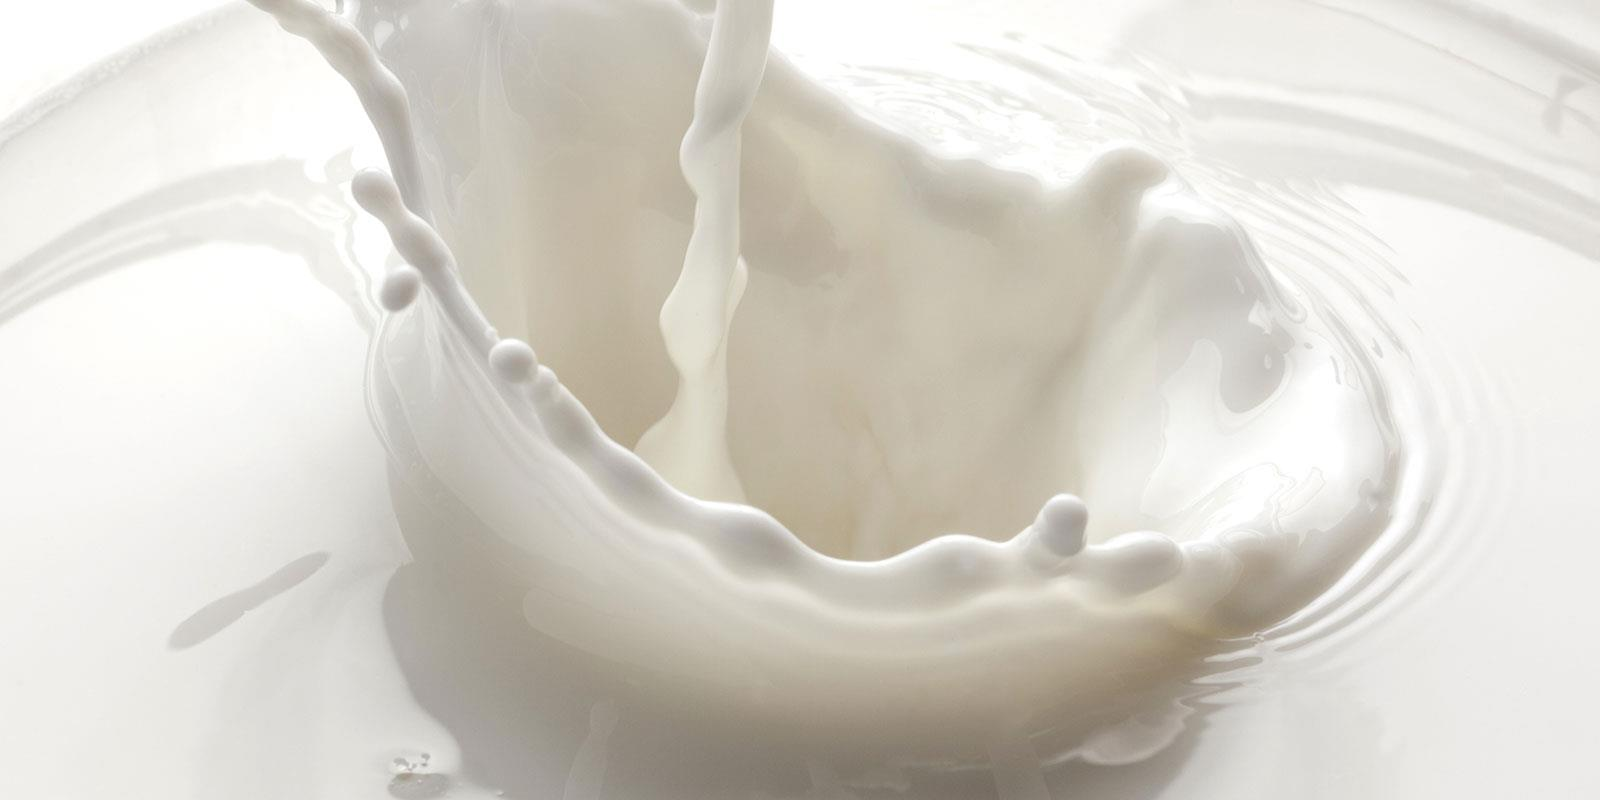 cibi-senza-latte